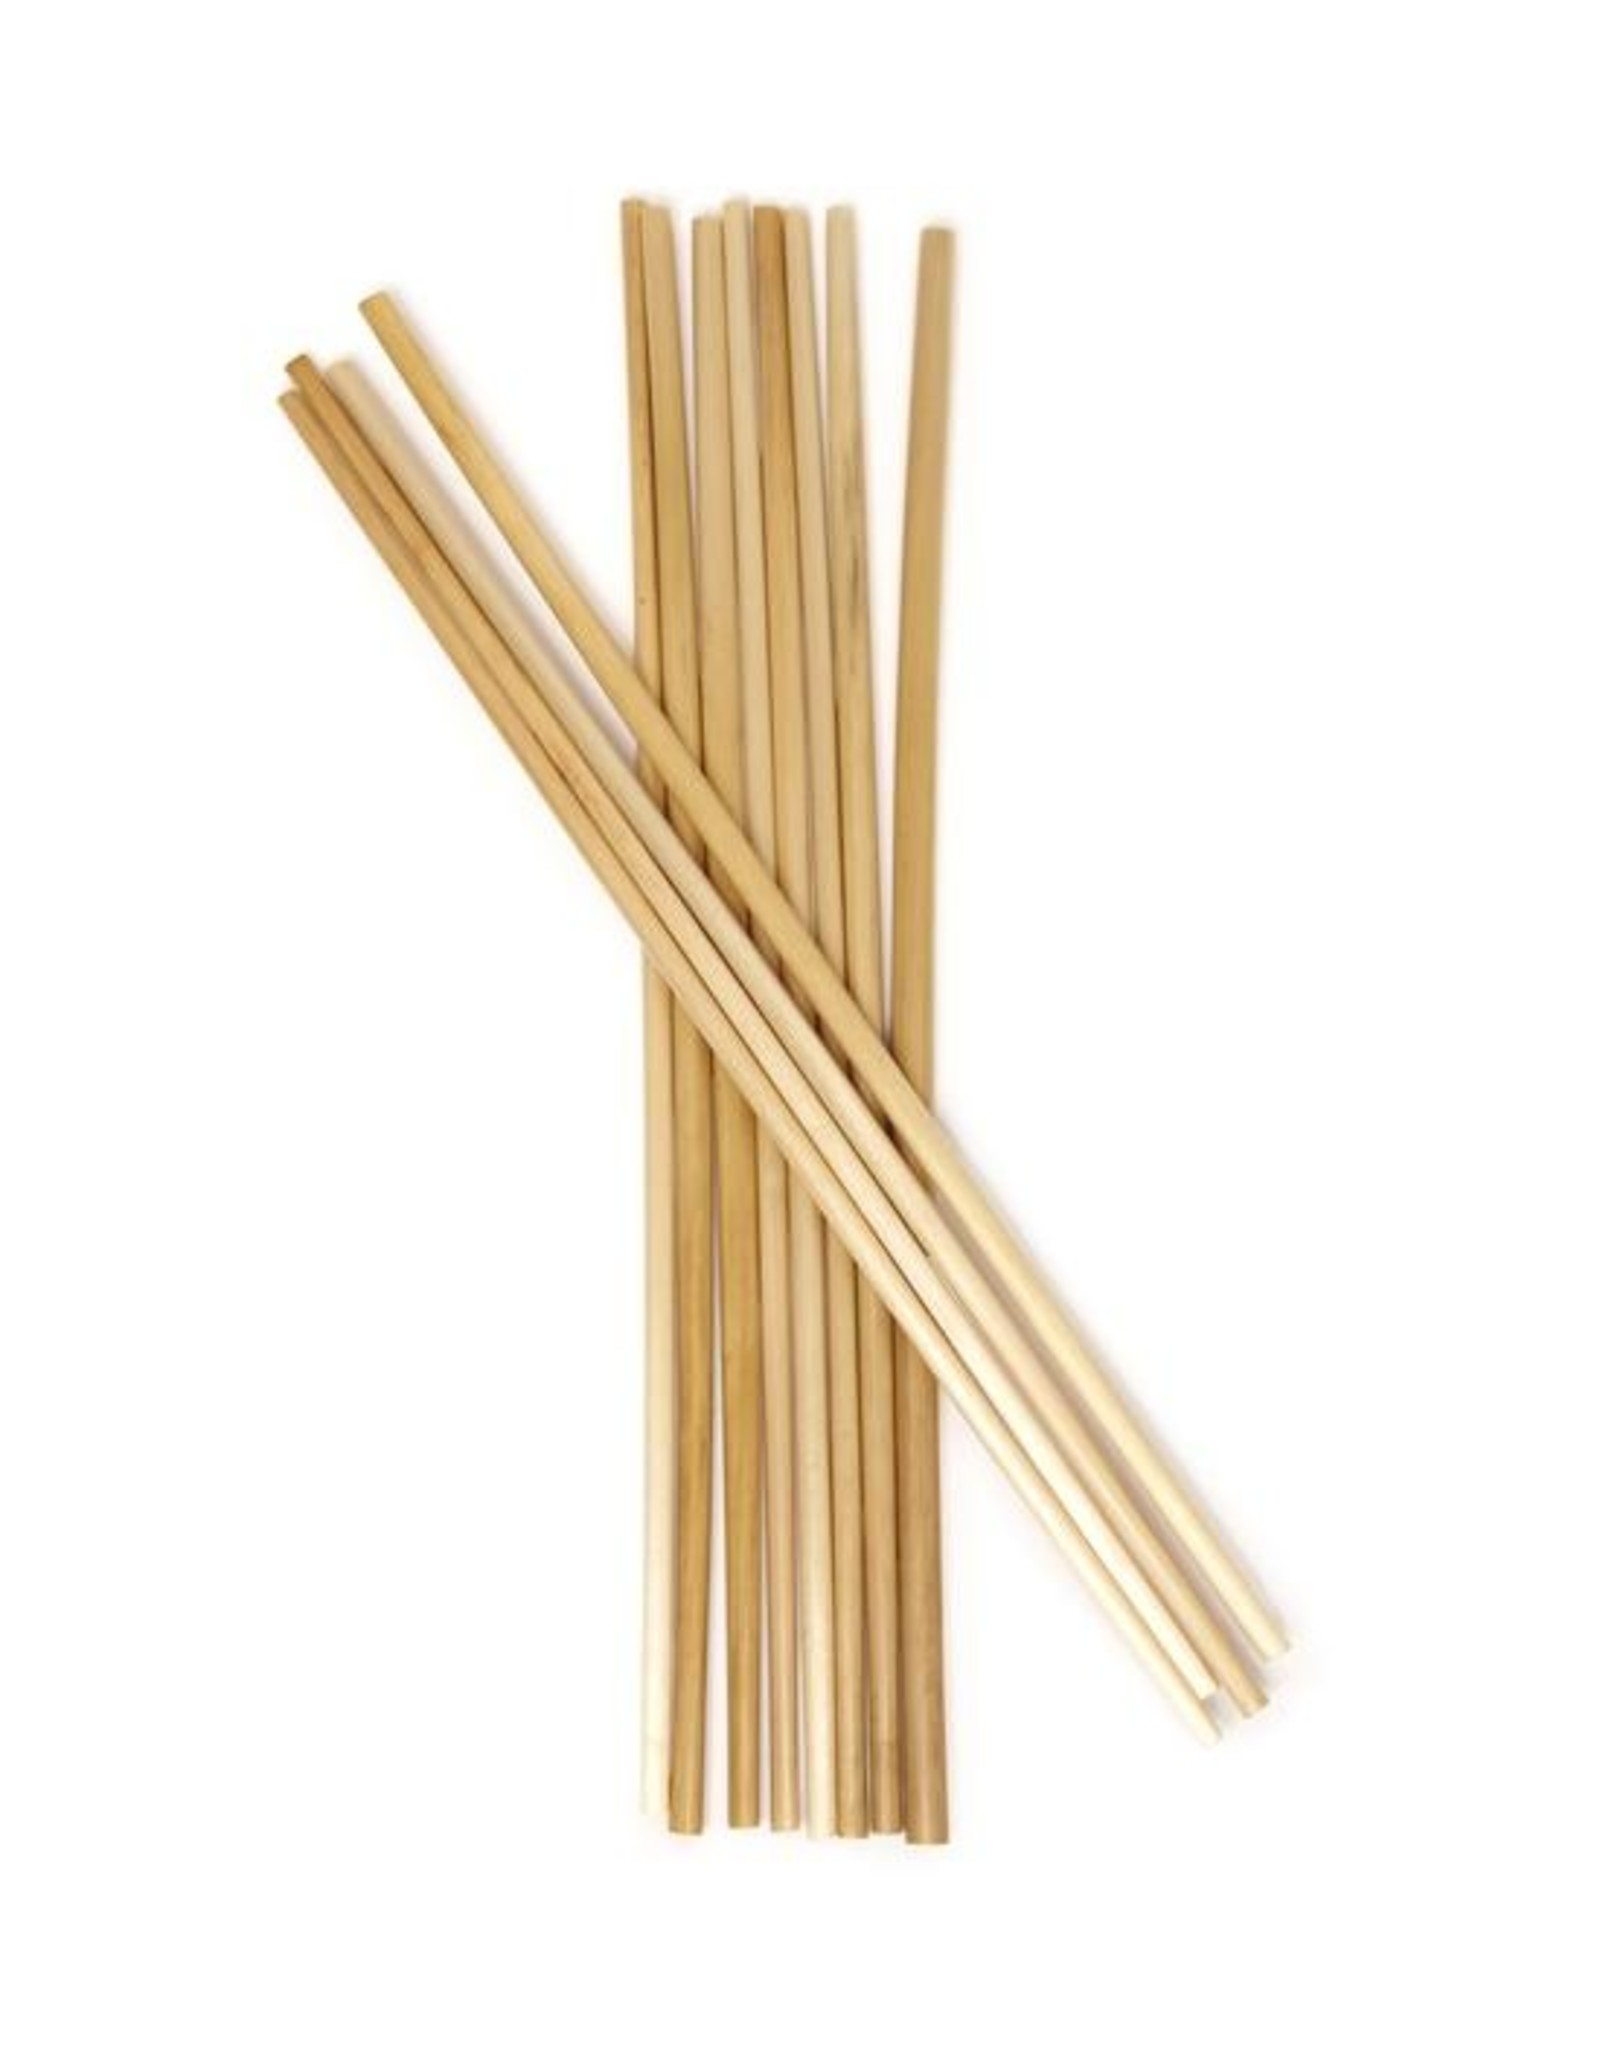 Kikkerland Kikkerland Natural Bamboo Straws 8 pieces